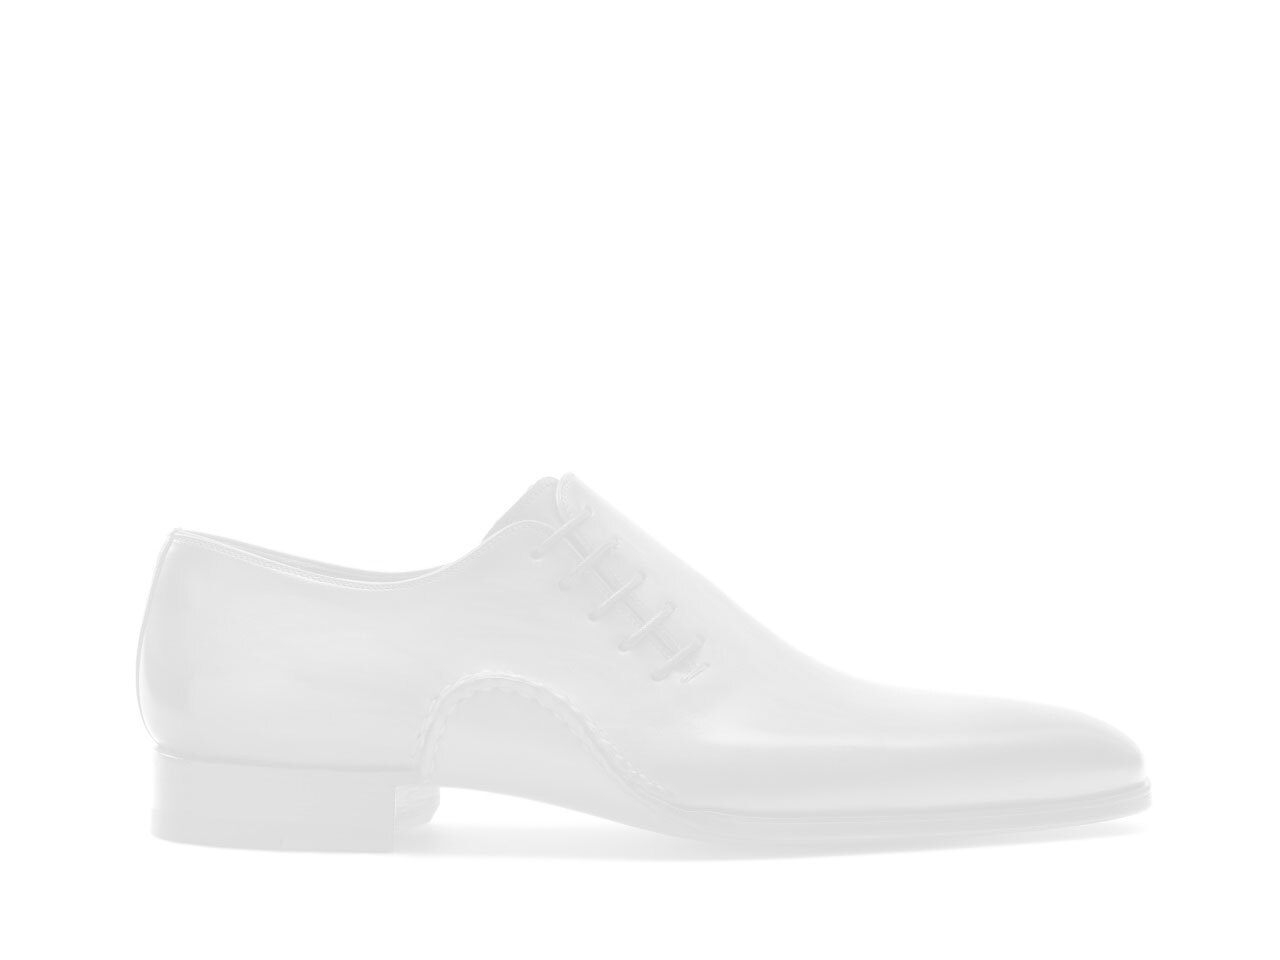 Castoro brown leather penny loafer shoes for men - Magnanni